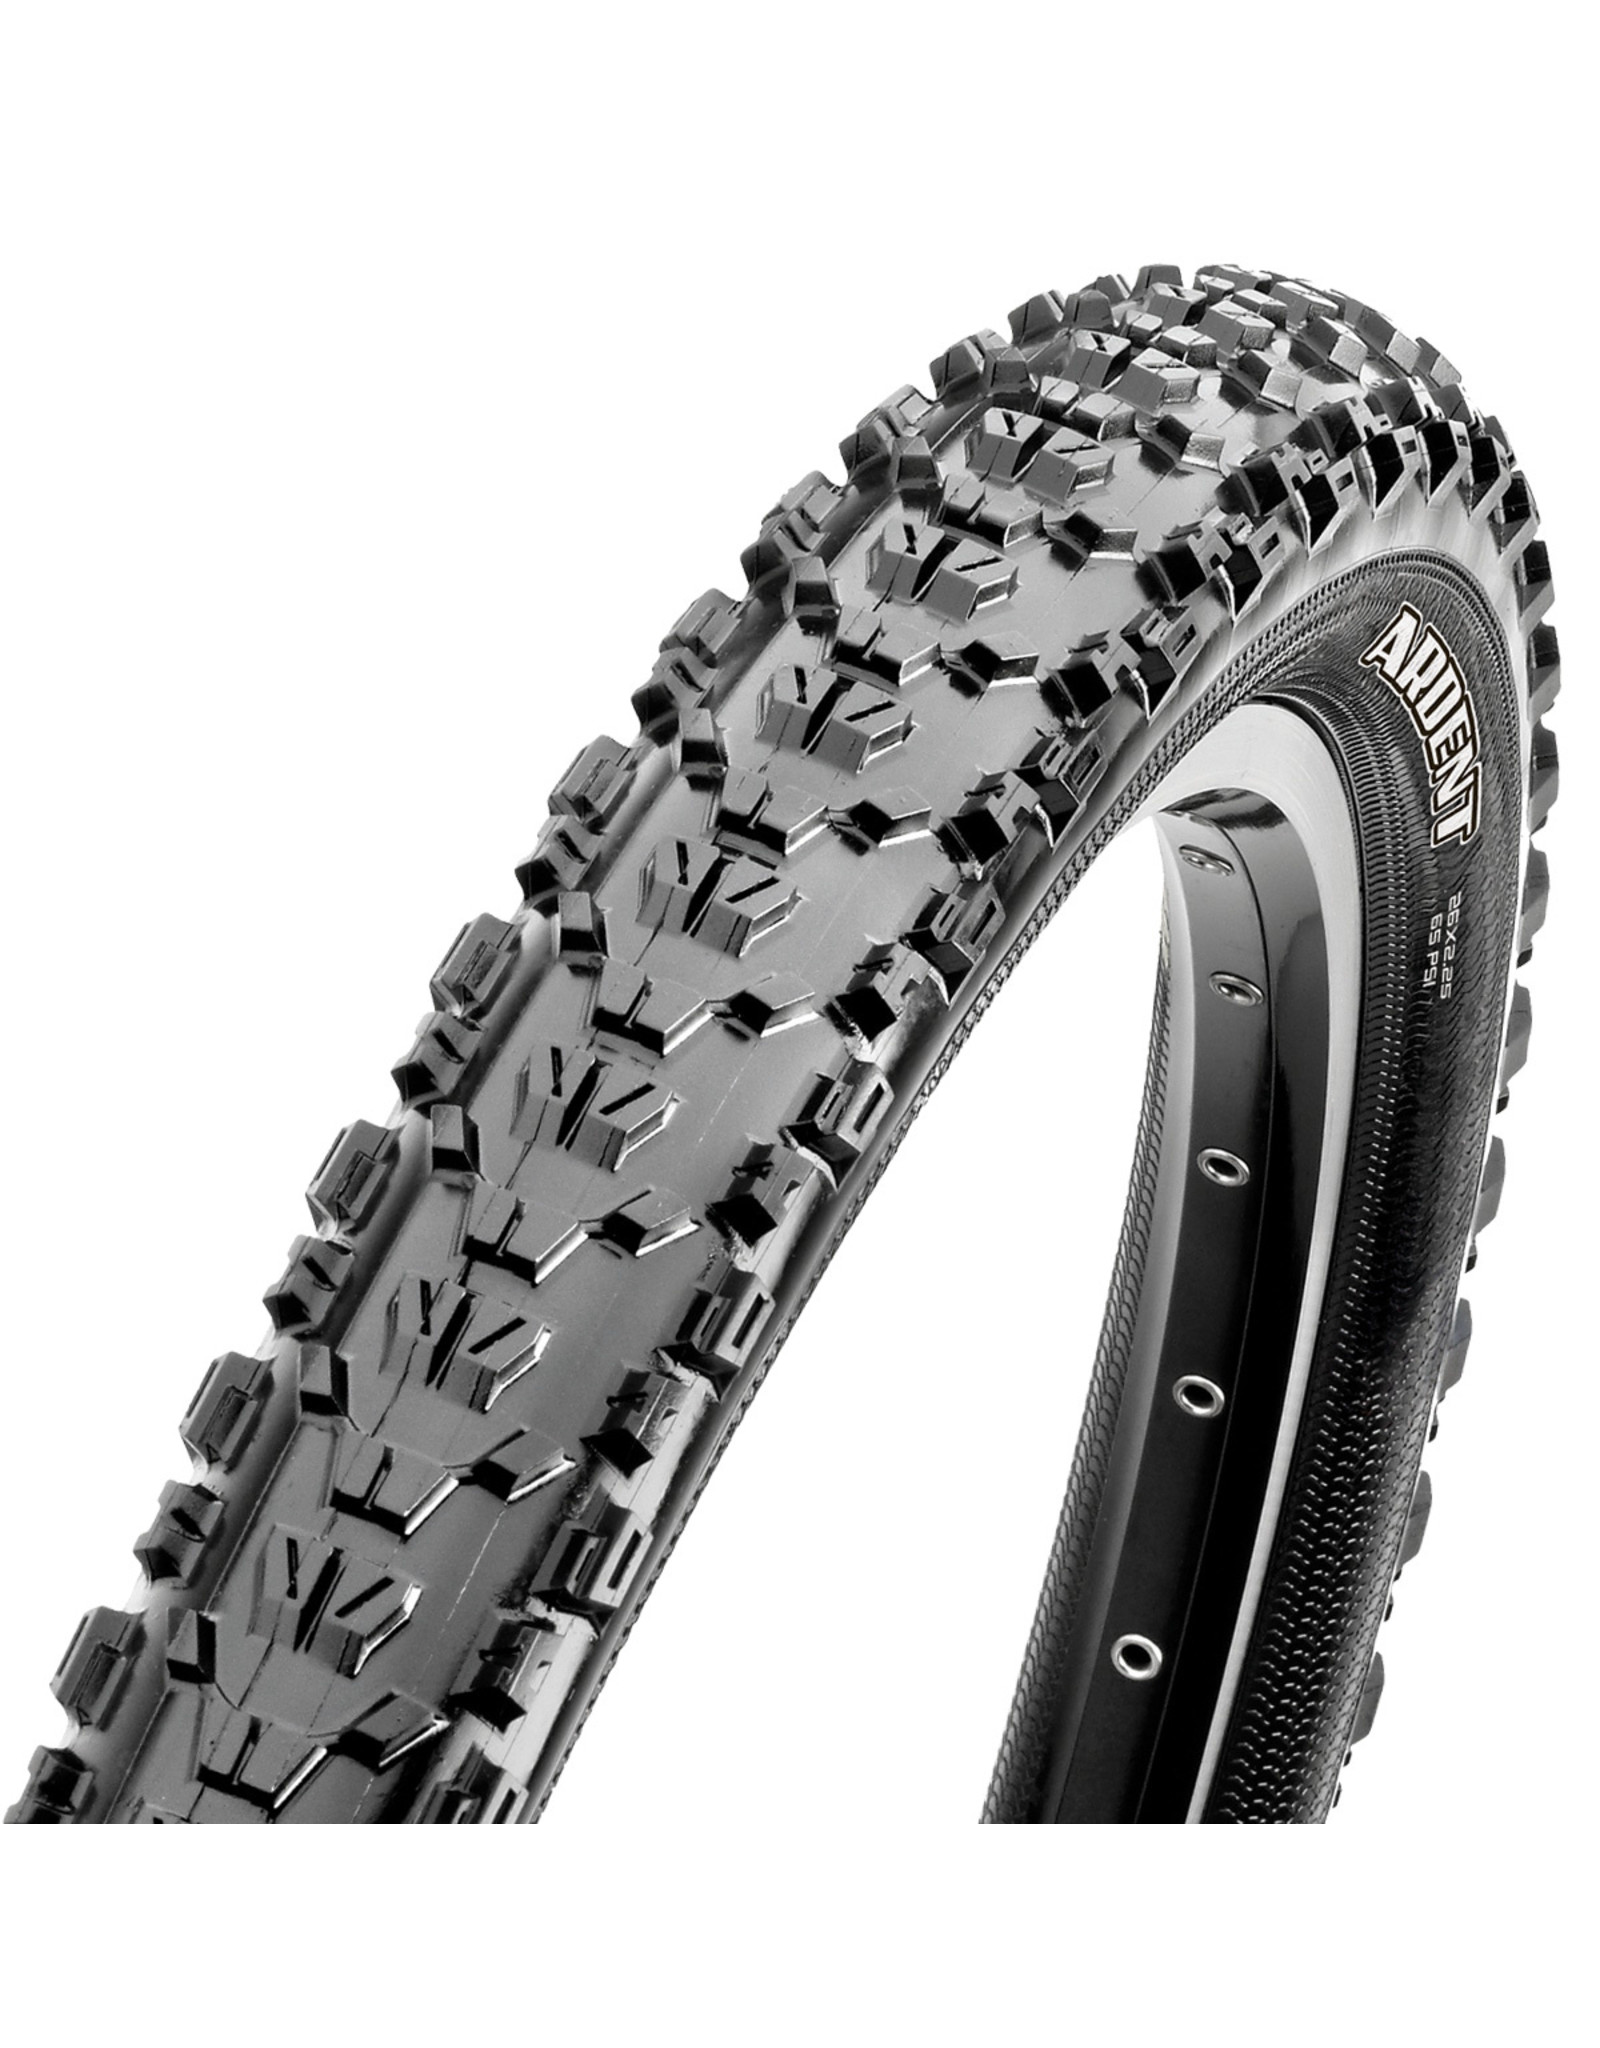 Maxxis Maxxis Ardent Tire 26''x2.40 Folding Tubeless Ready Dual EXO 60TPI Black